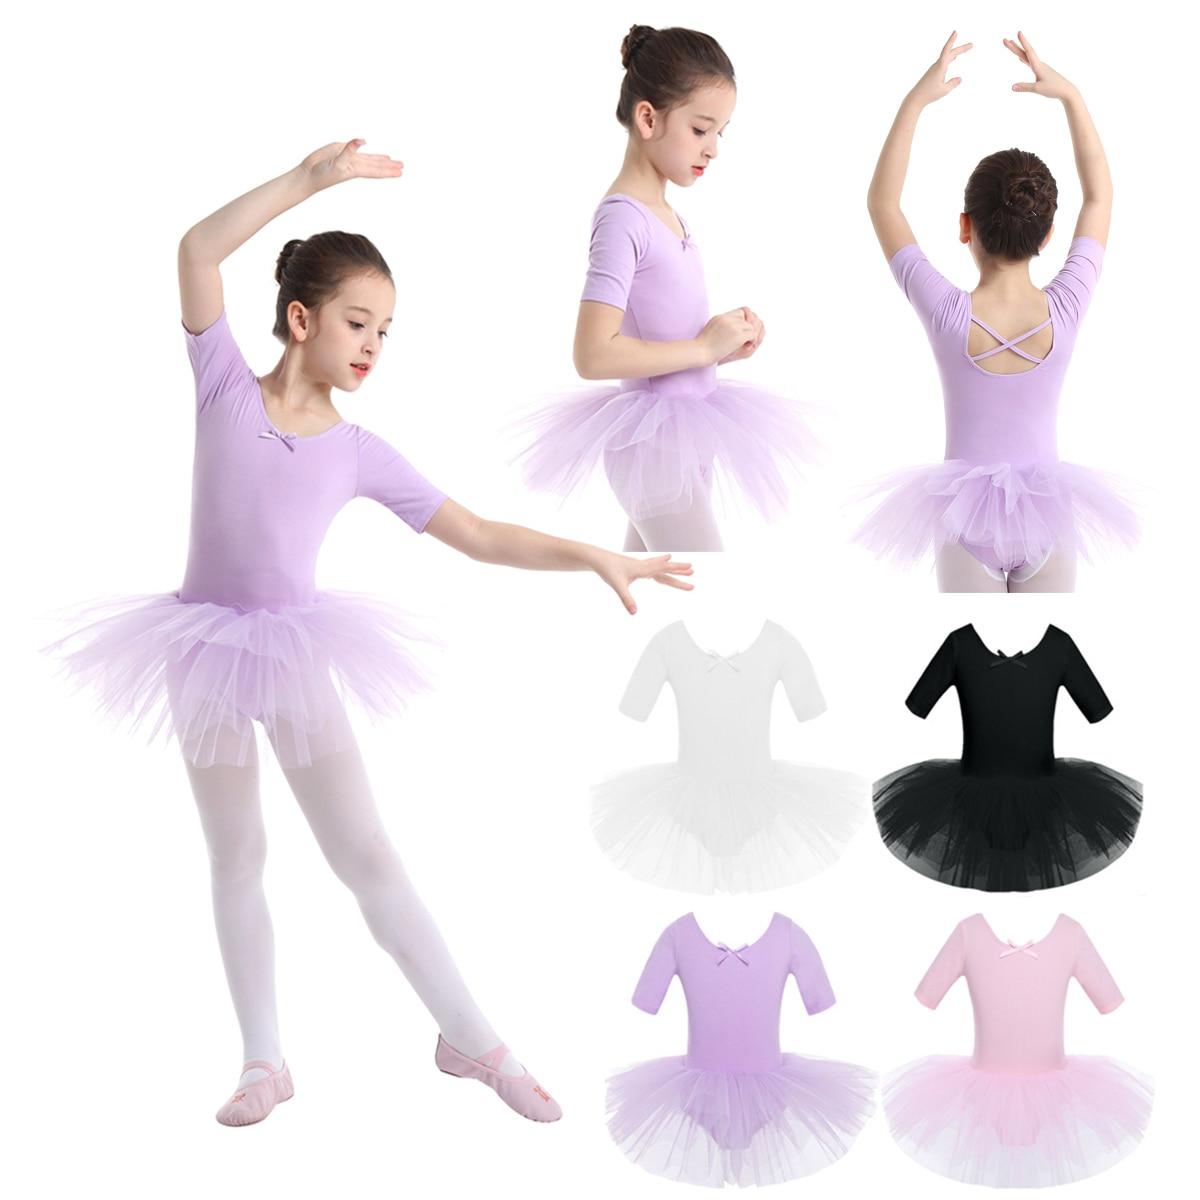 2-10 Years Kids Girls Dancewear Short Sleeve Cotton Tulle Ballet Dance Gymnastics Leotard Performance Tutu Dress Fast delivery